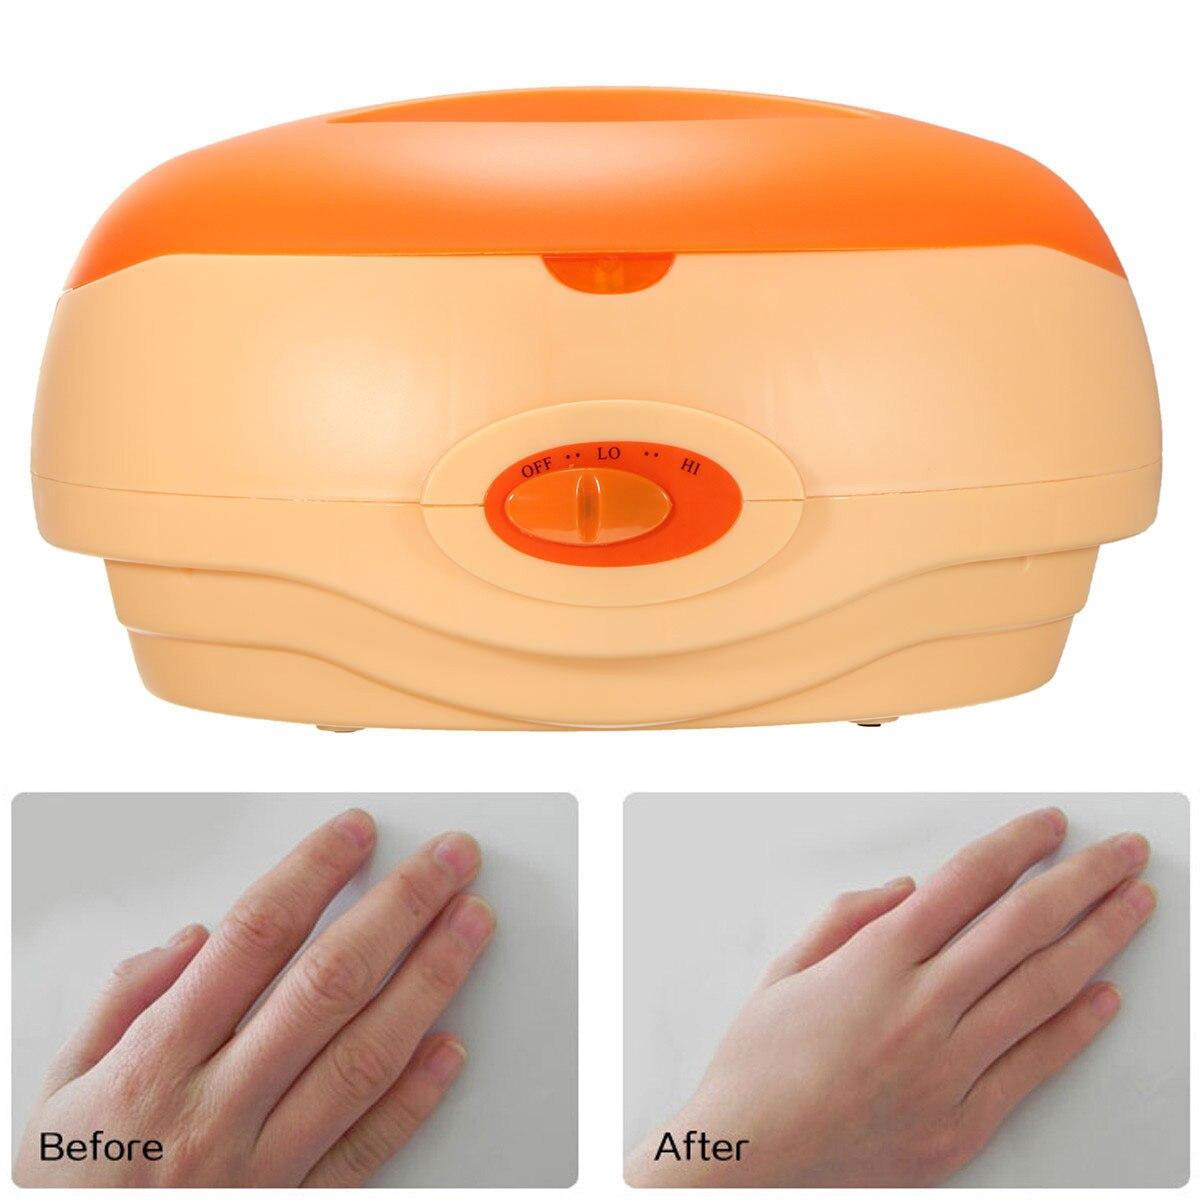 Hot 180W Paraffin Therapy Bath Wax Pot Warmer 2 Level Control Machine Beauty Salon Spa Keritherapy System Wax Heater Equipment<br>